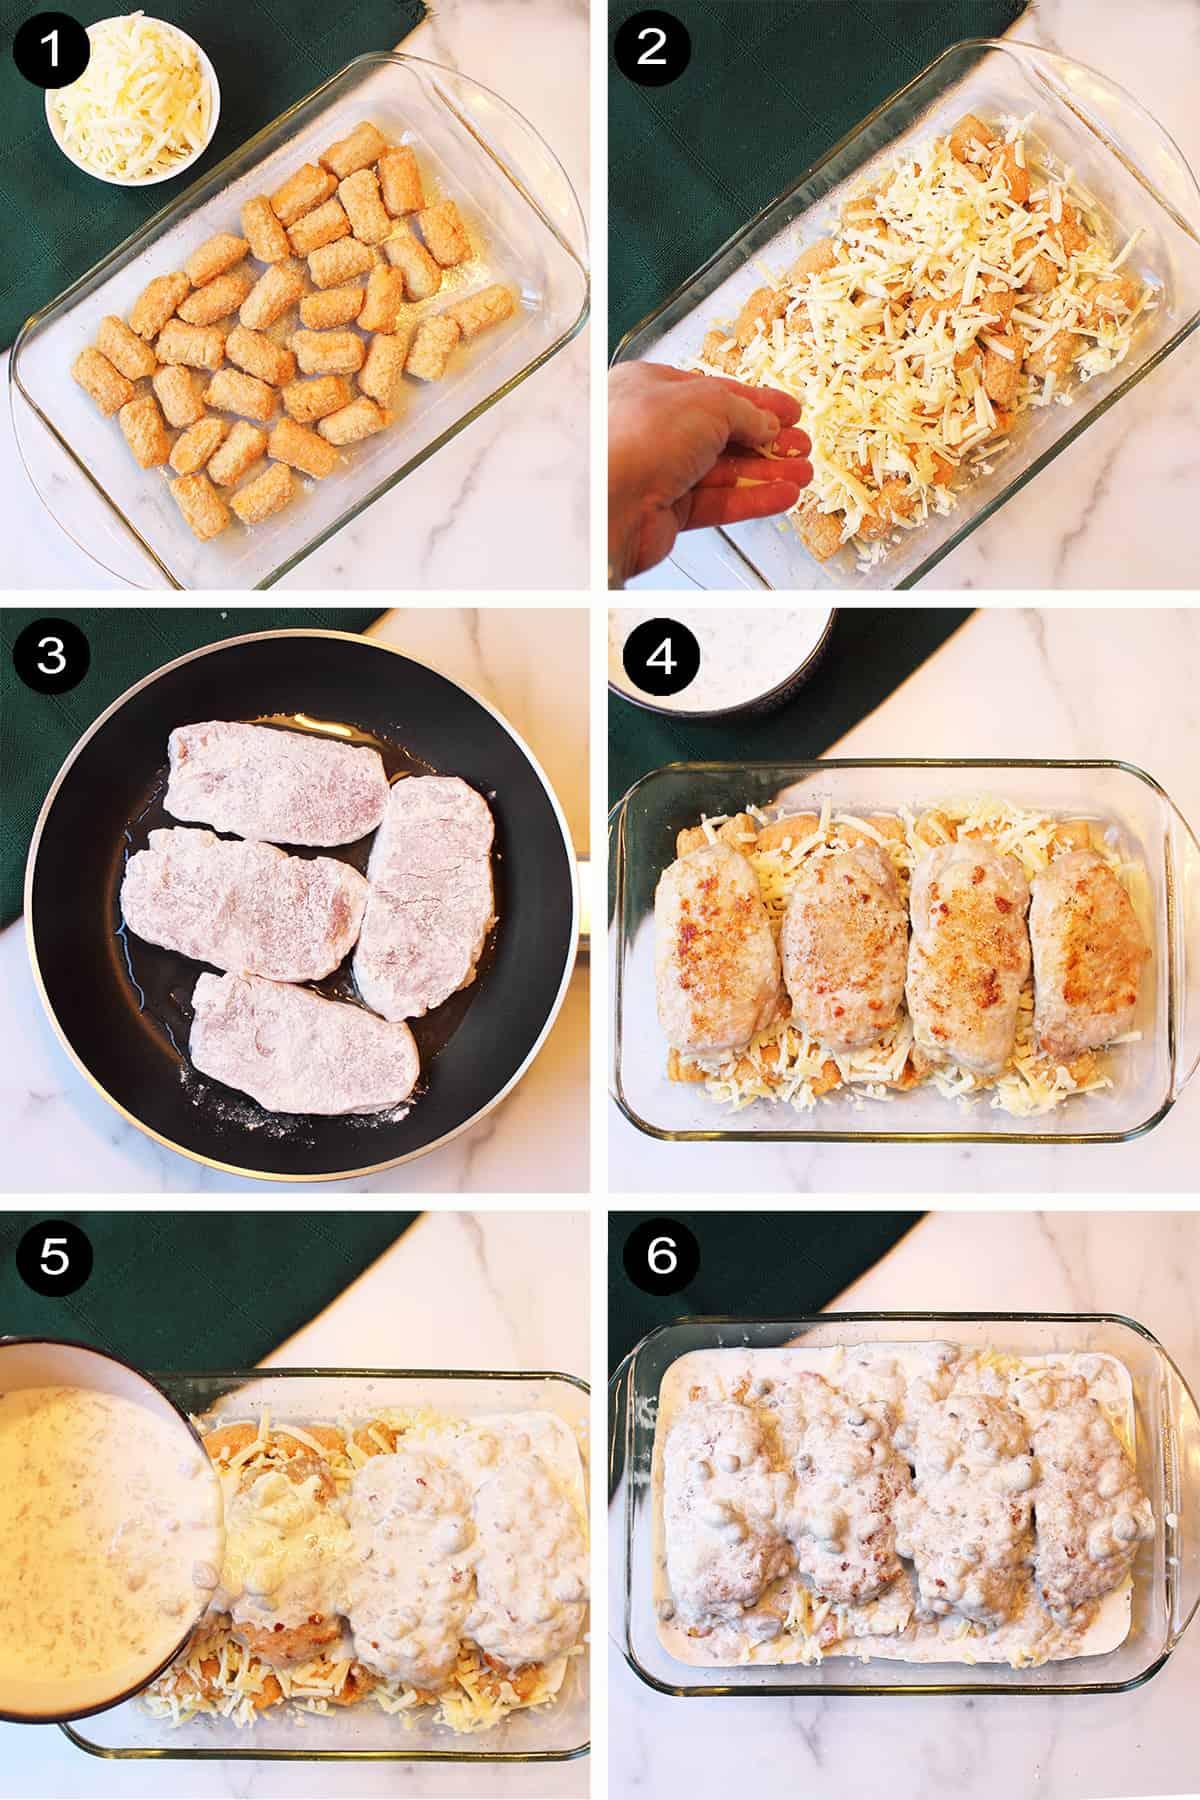 Steps 1-6 for Pork Chop Casserole.